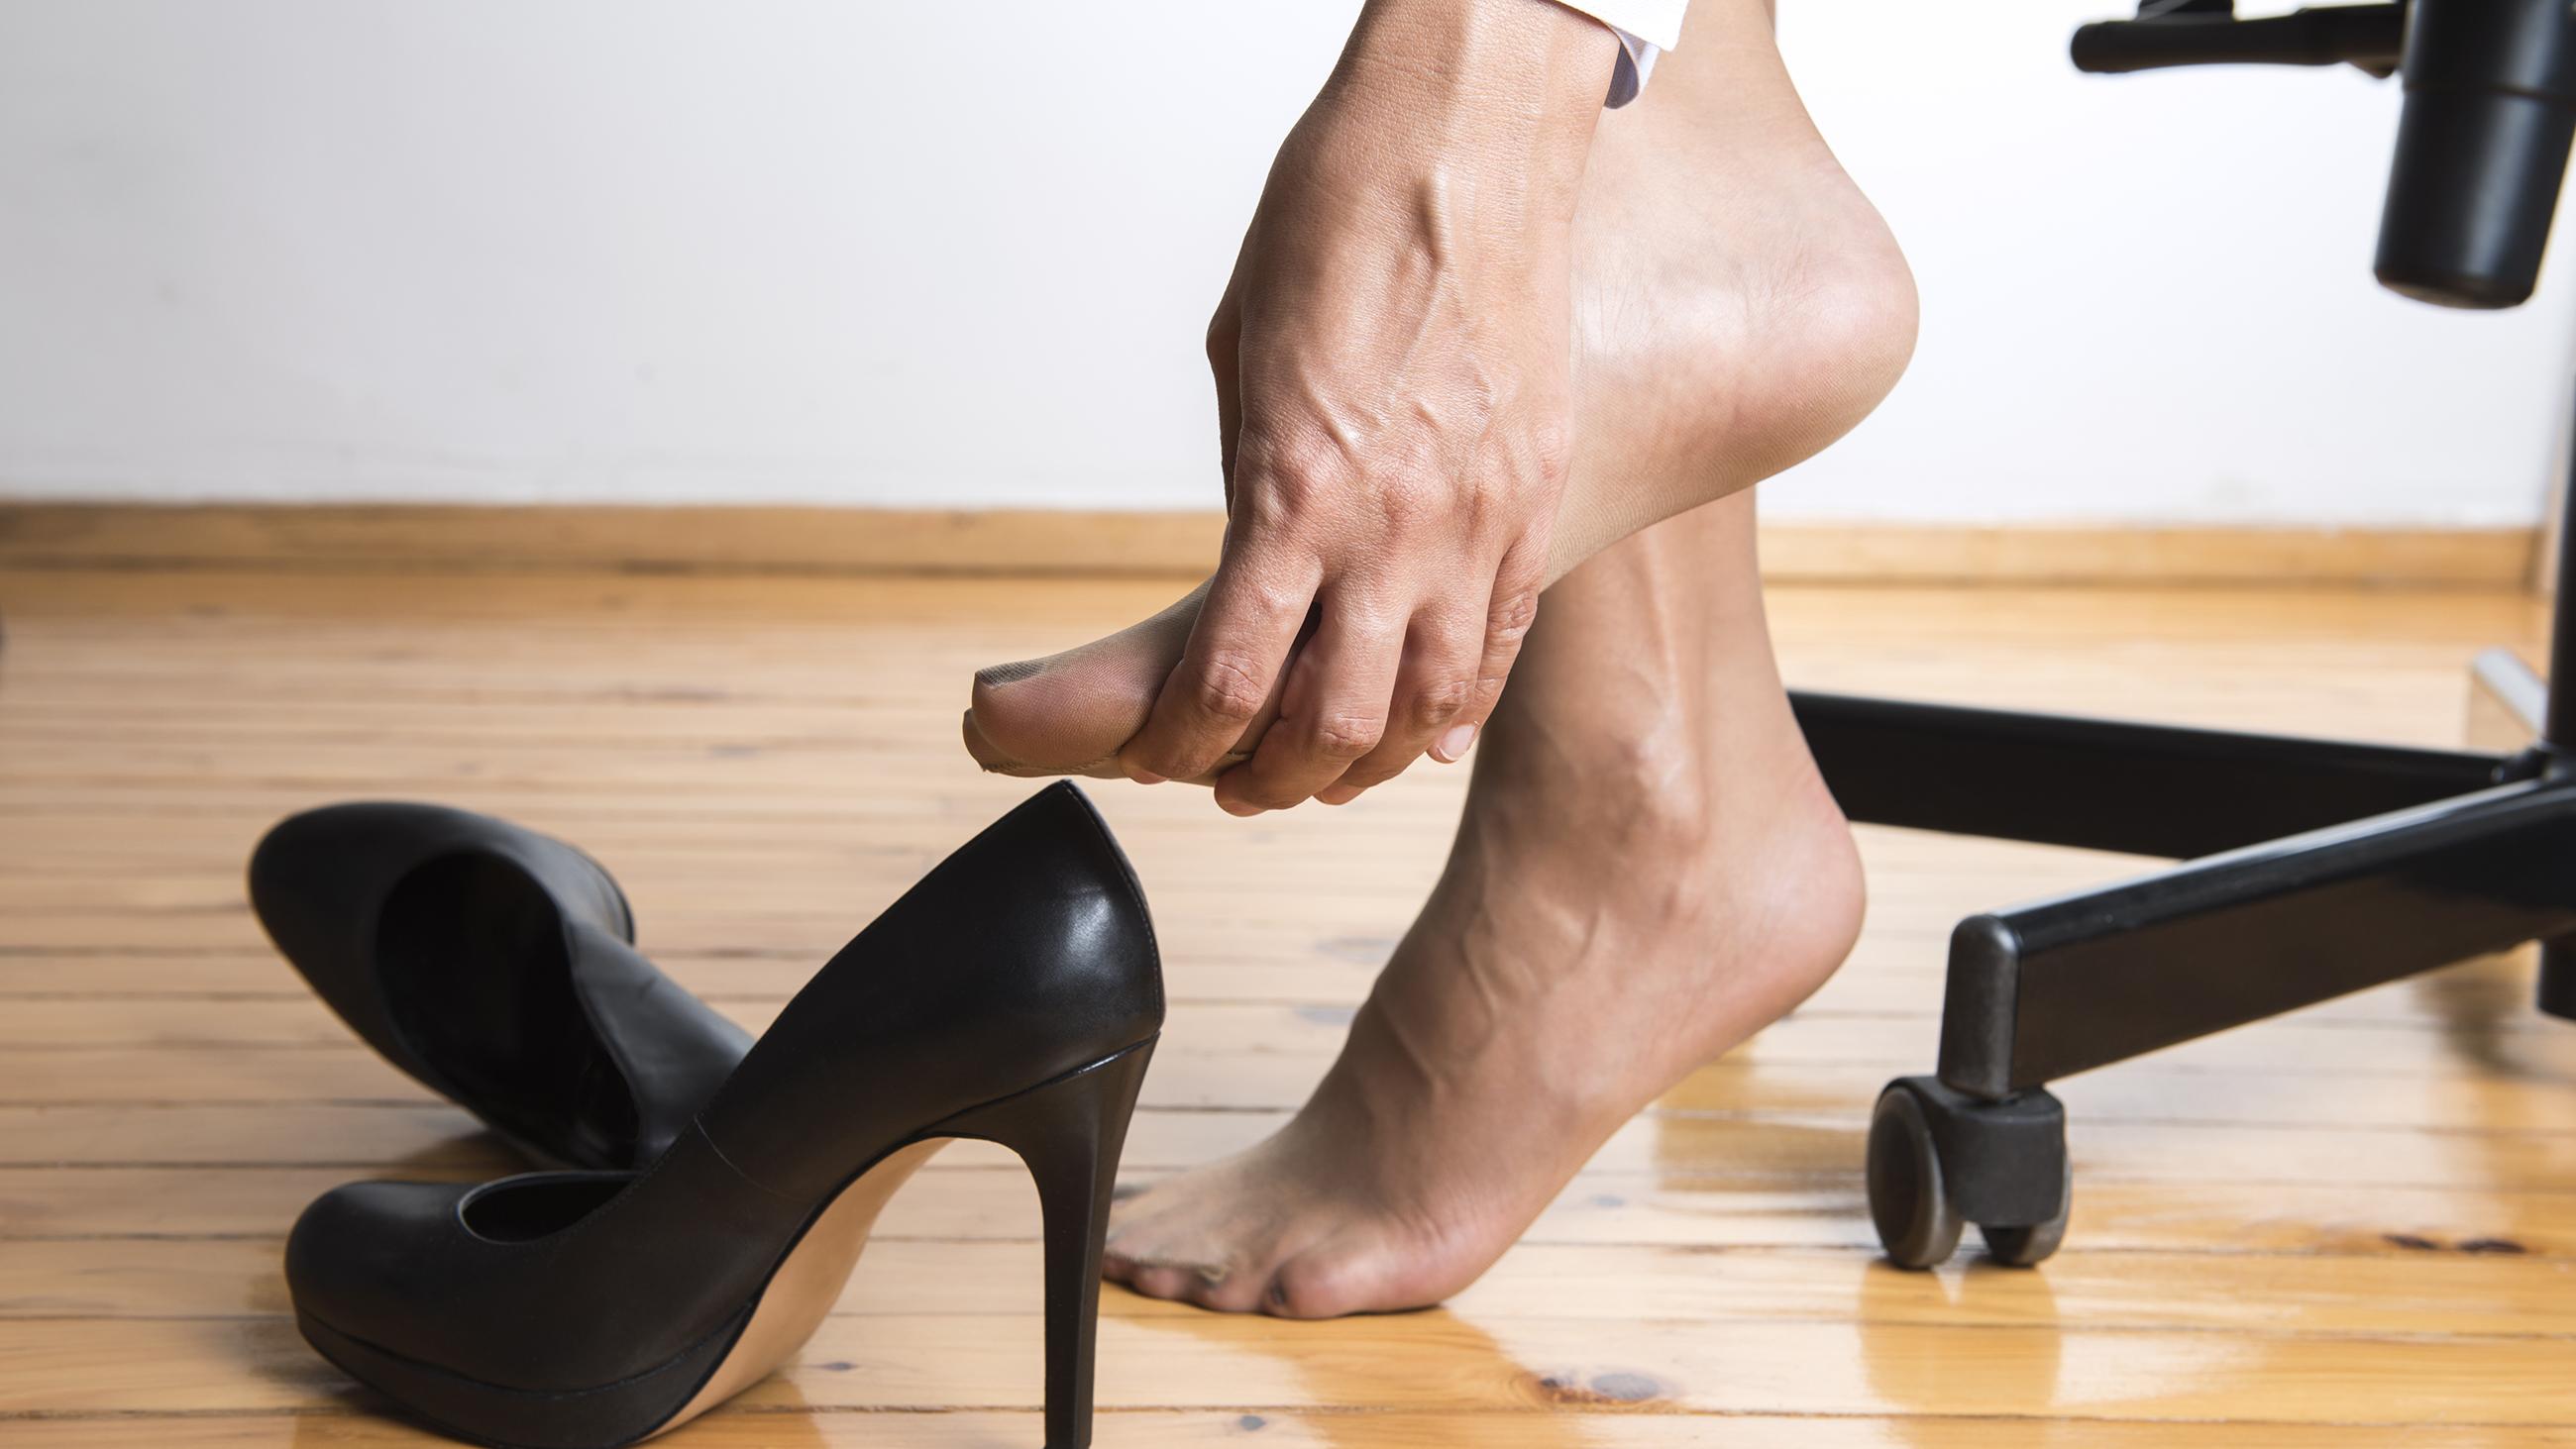 Do High Heels Cause Bunions?